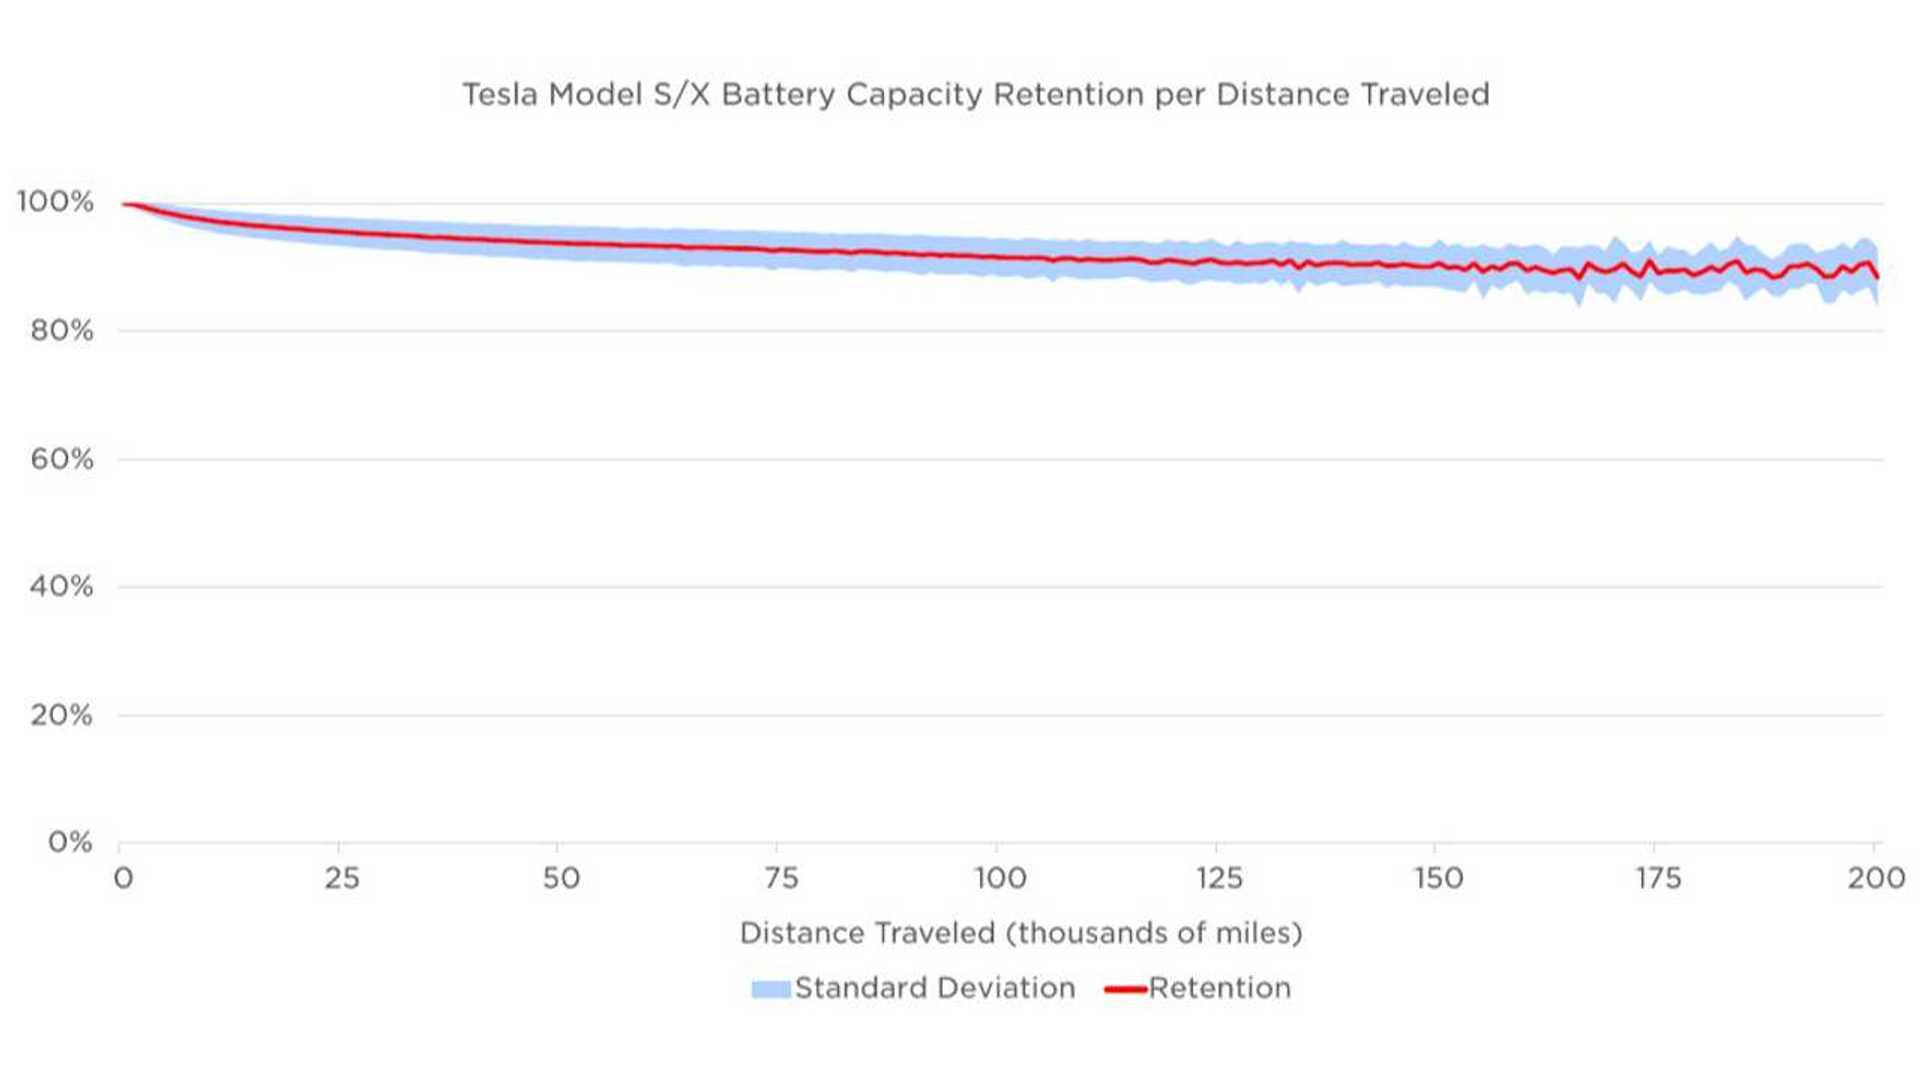 tesla-model-s-x-battery-capacity-retention-per-distance-traveled.jpg